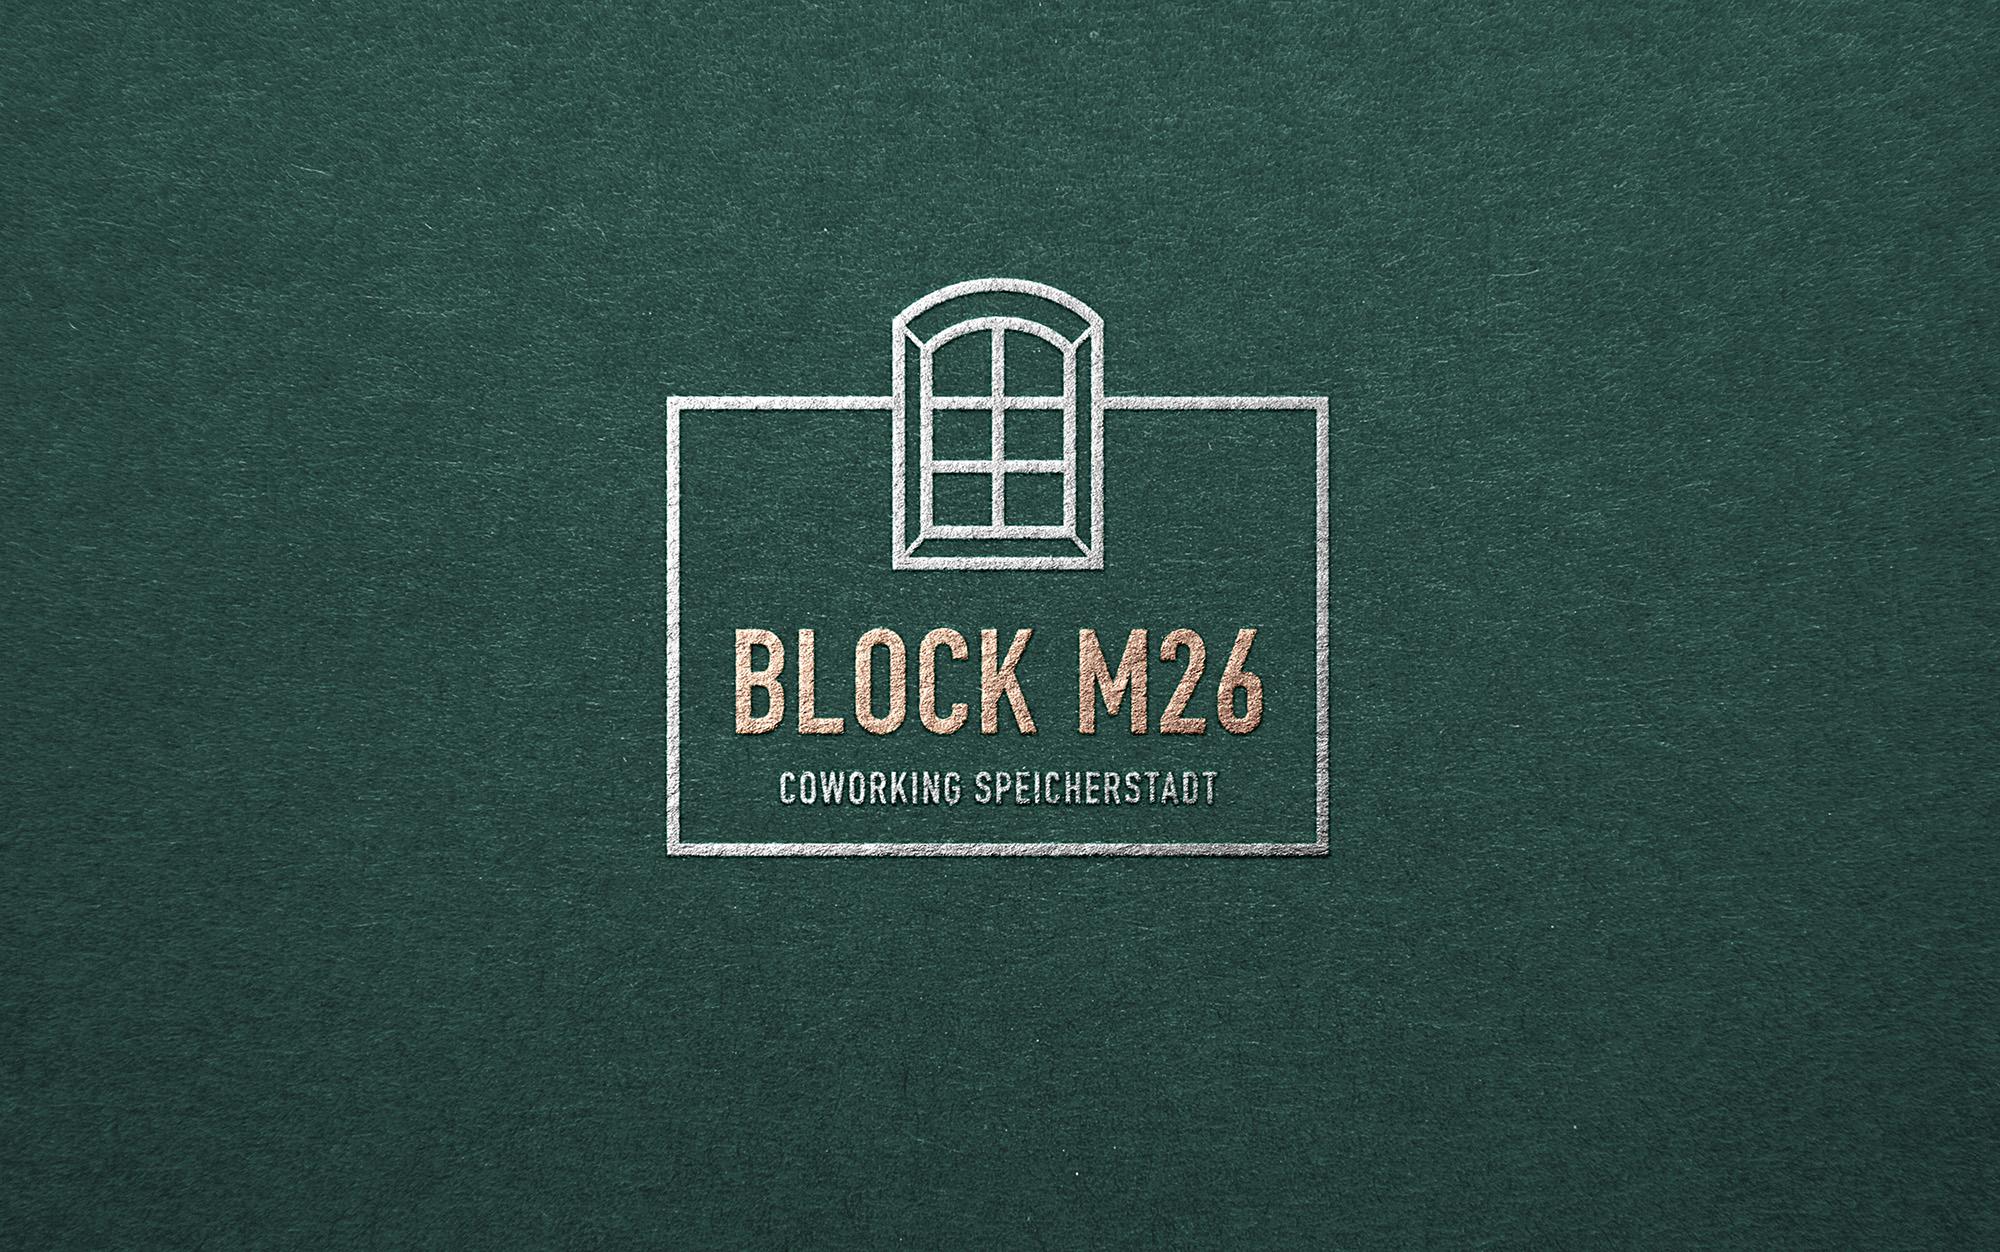 BlockM26_HKK4